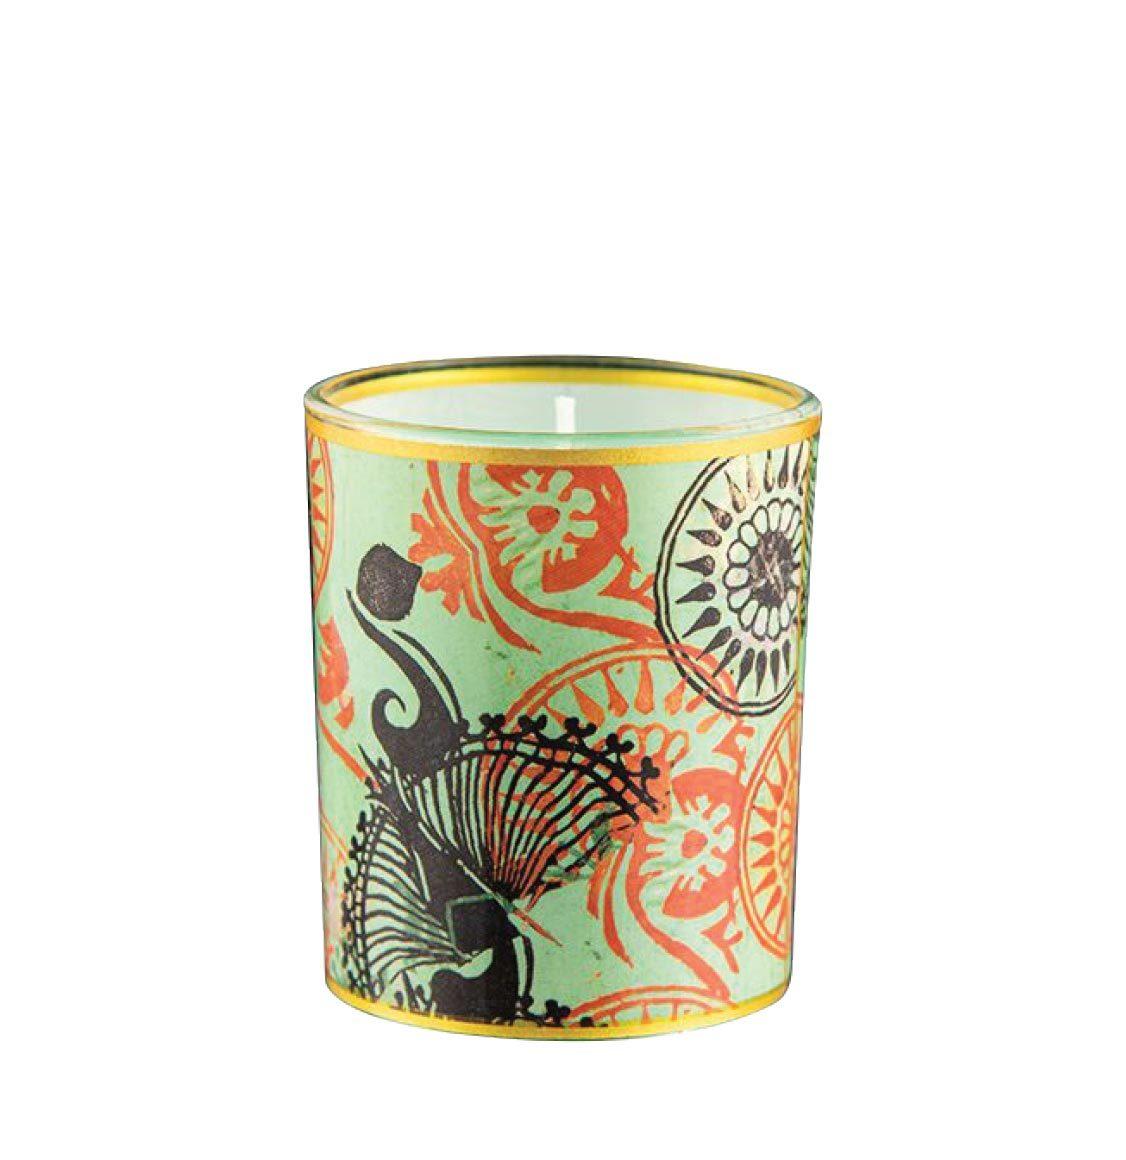 Ortigia Sicilia Fico D' India Decorated Candle 150g